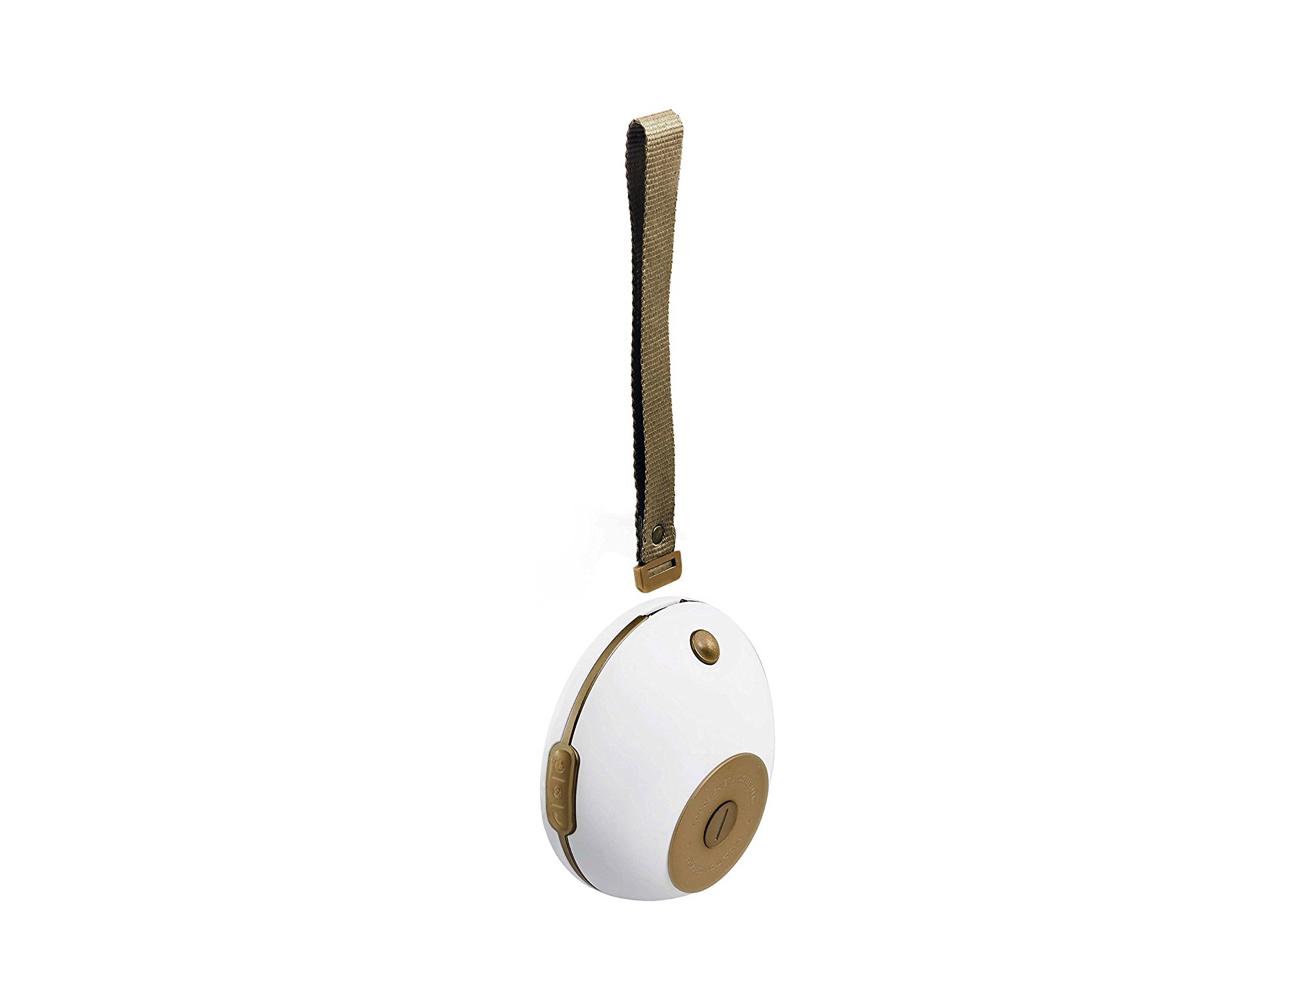 Stelle Audio Go-Go Portable Bluetooth Speaker